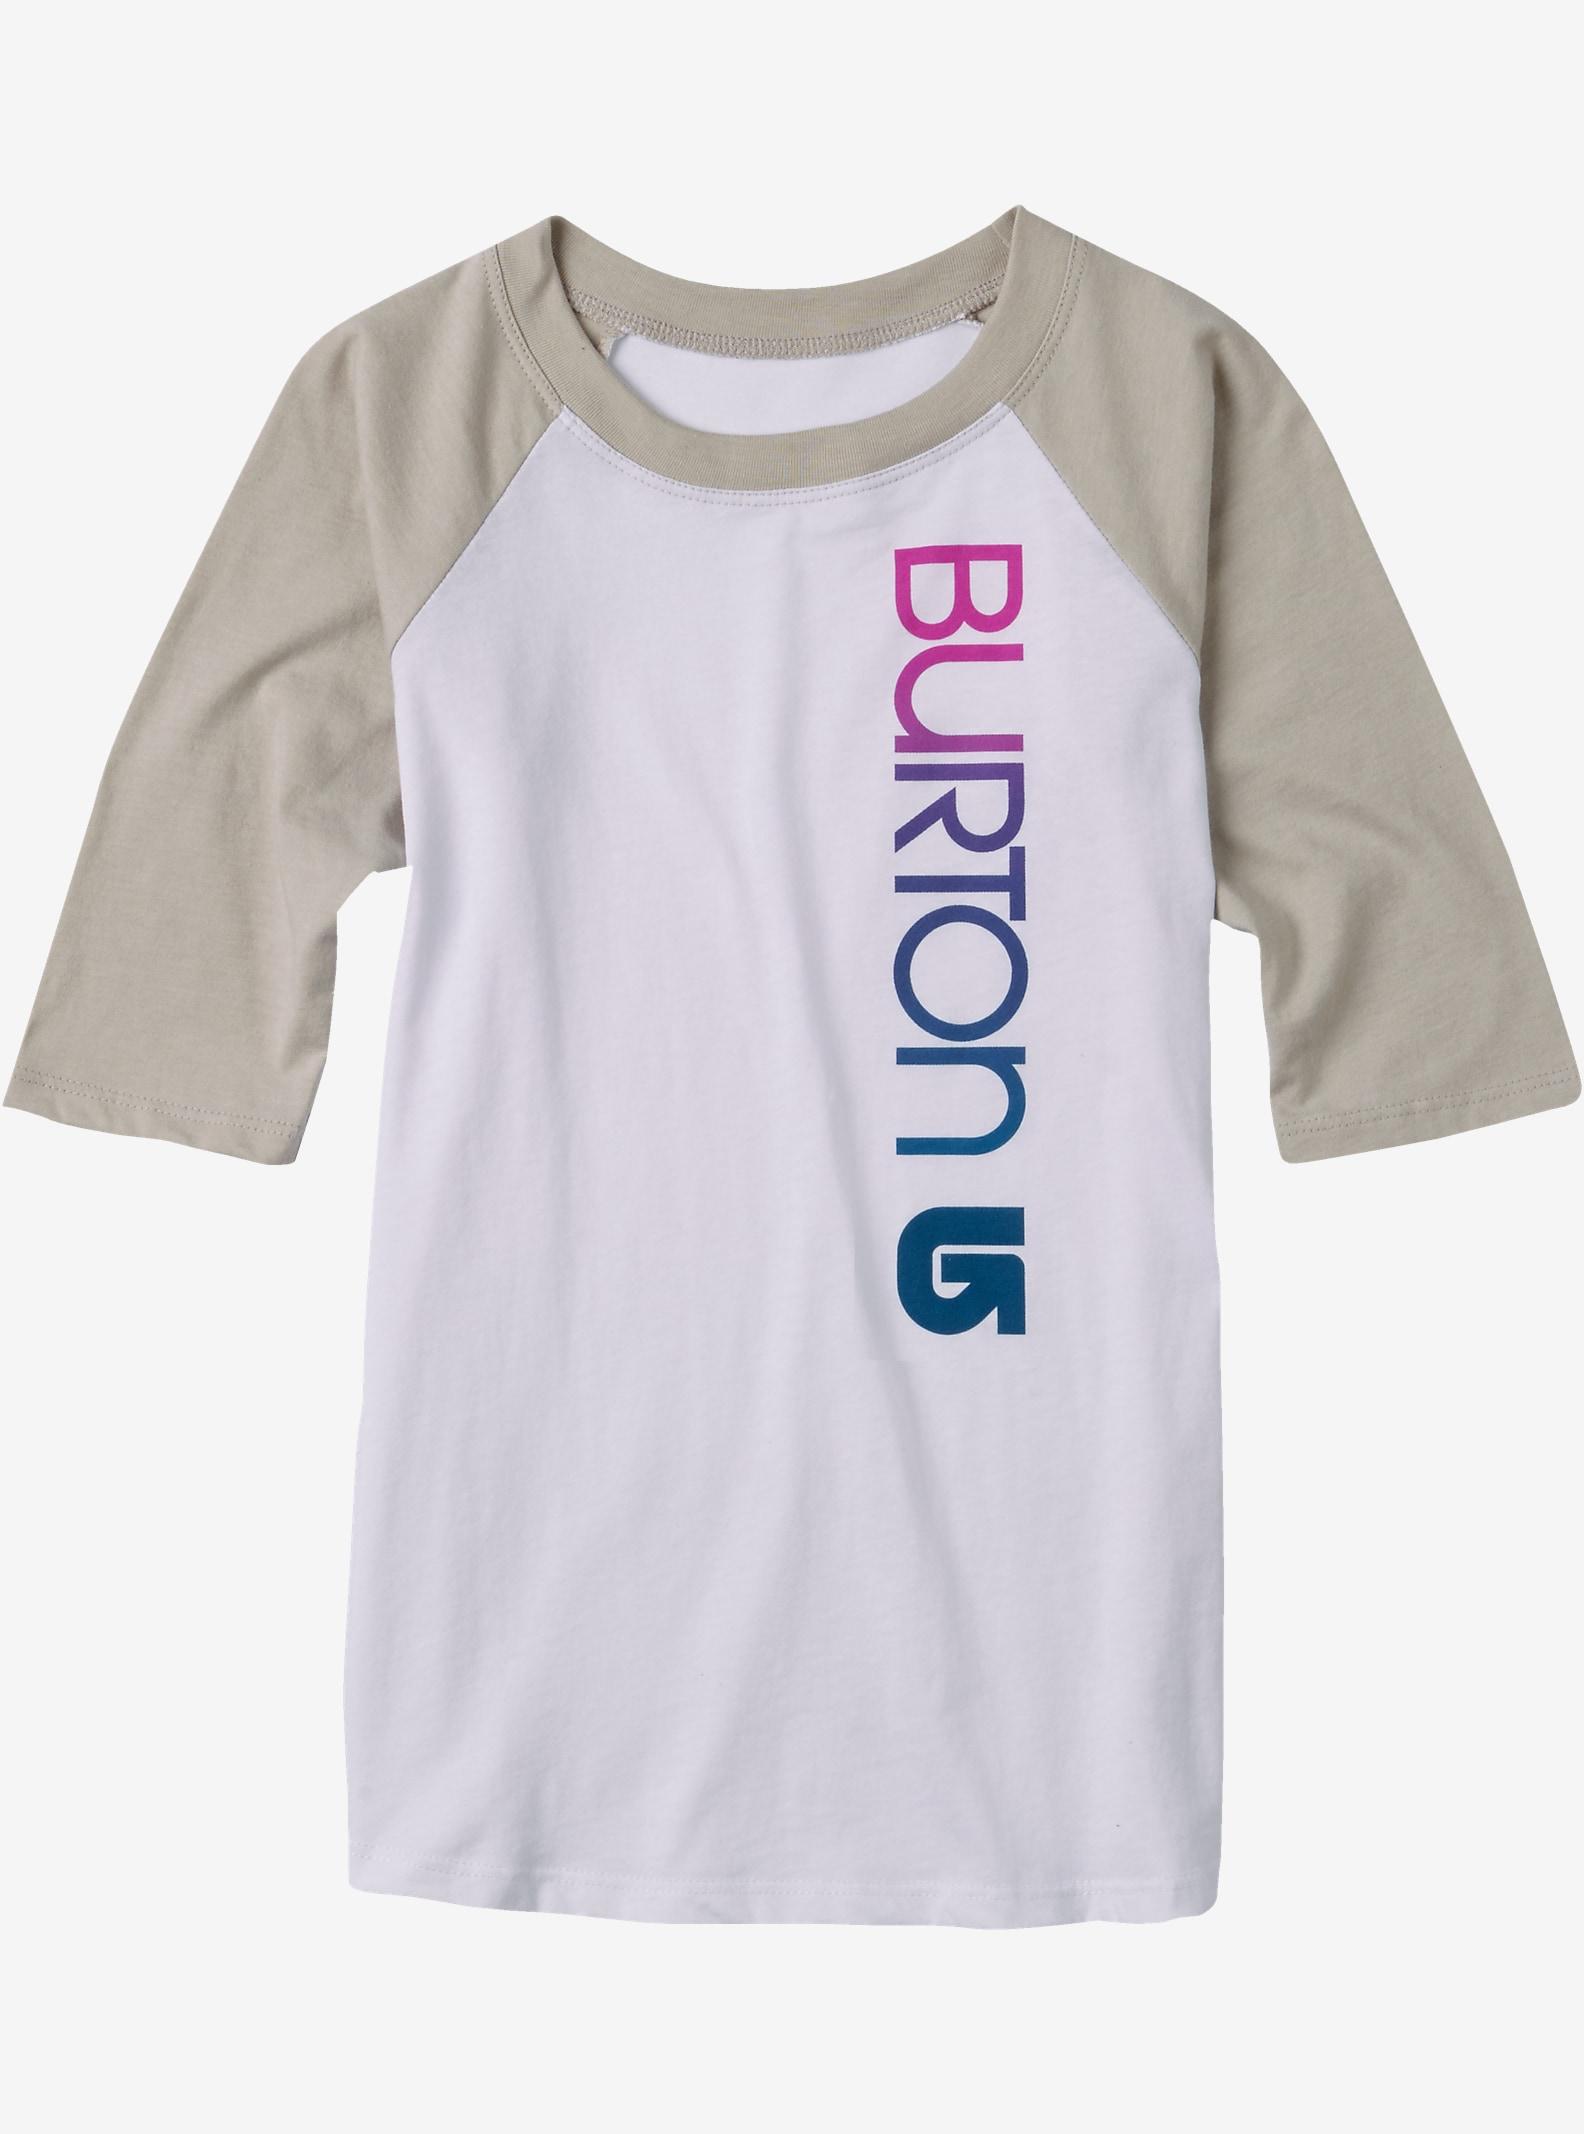 Burton Antidote Raglan Long Sleeve Shirt shown in Stout White